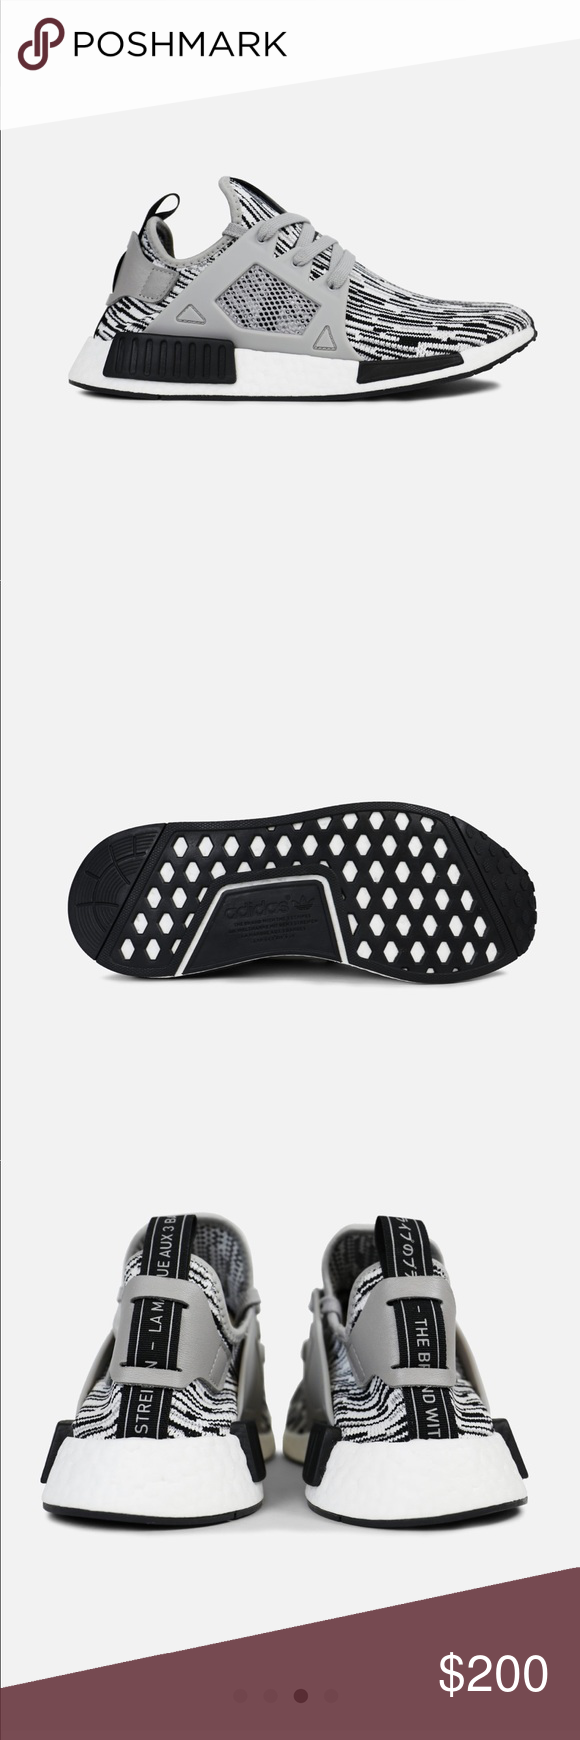 Adidas Uomo nmd nwt rx1 nero & gray nwt nmd pinterest 17e6e7